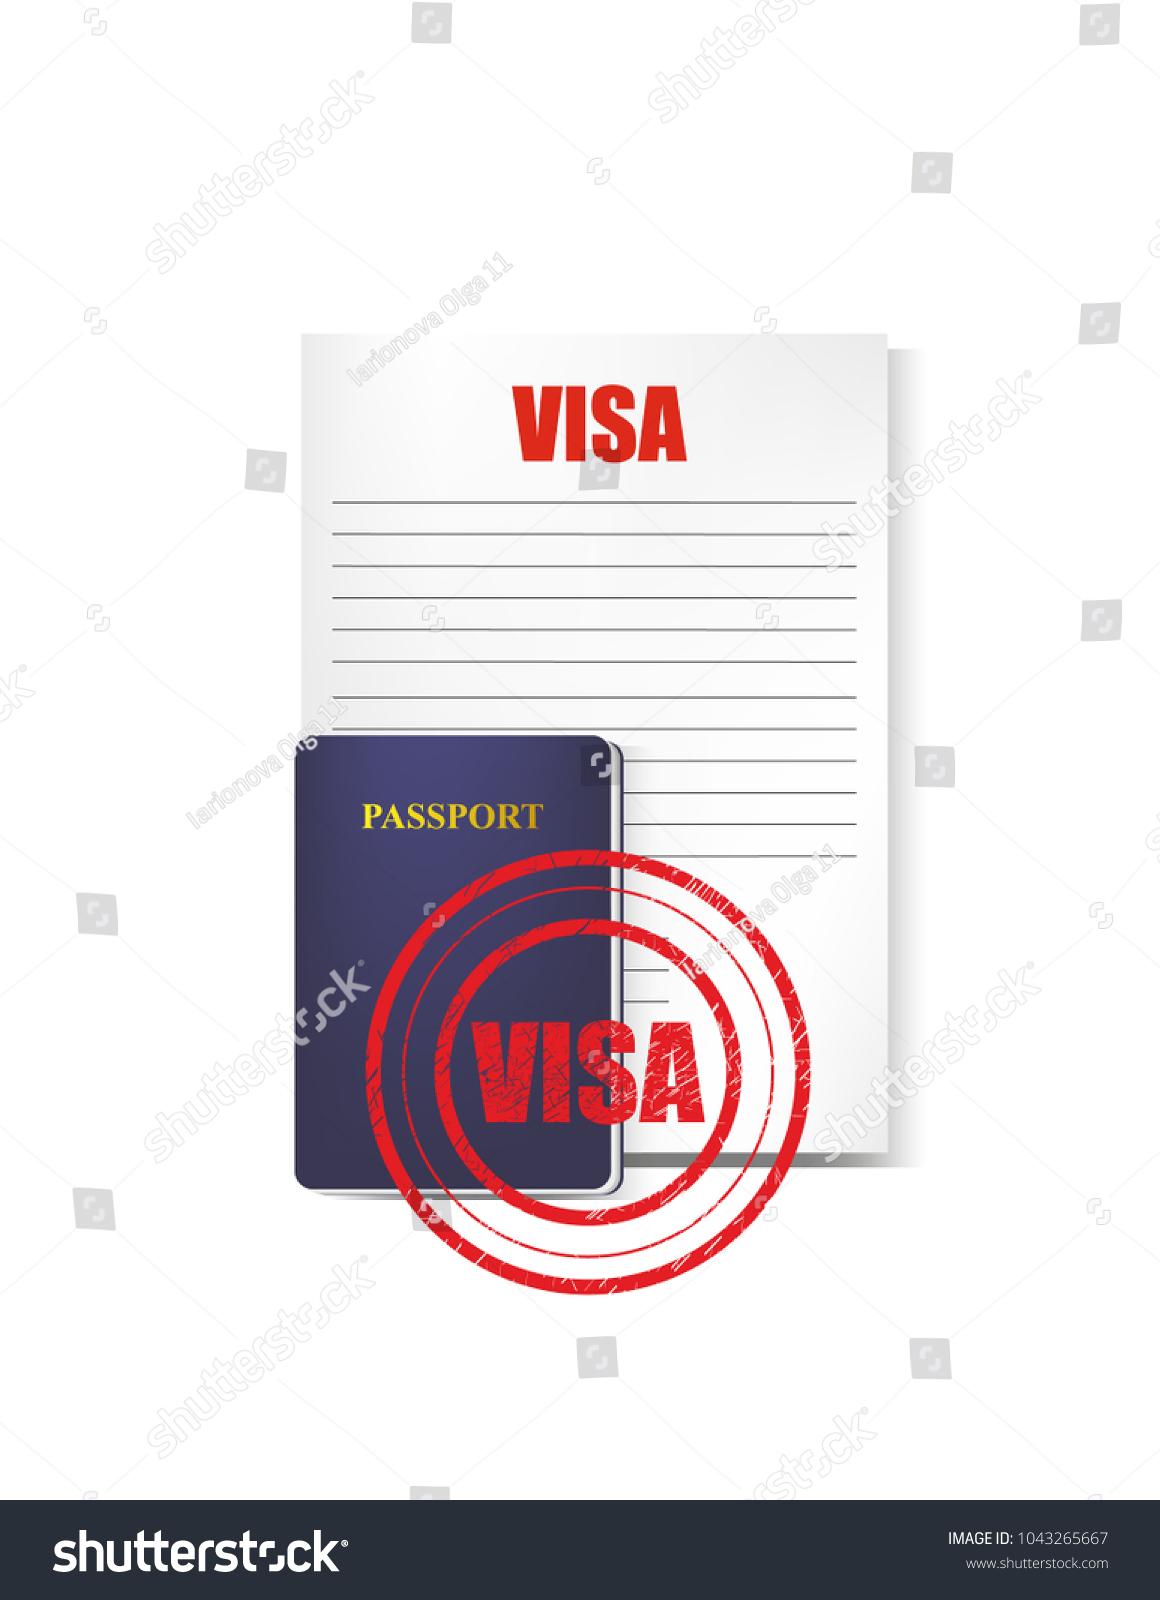 Visa stamp form stock vector 1043265667 shutterstock visa stamp form biocorpaavc Choice Image